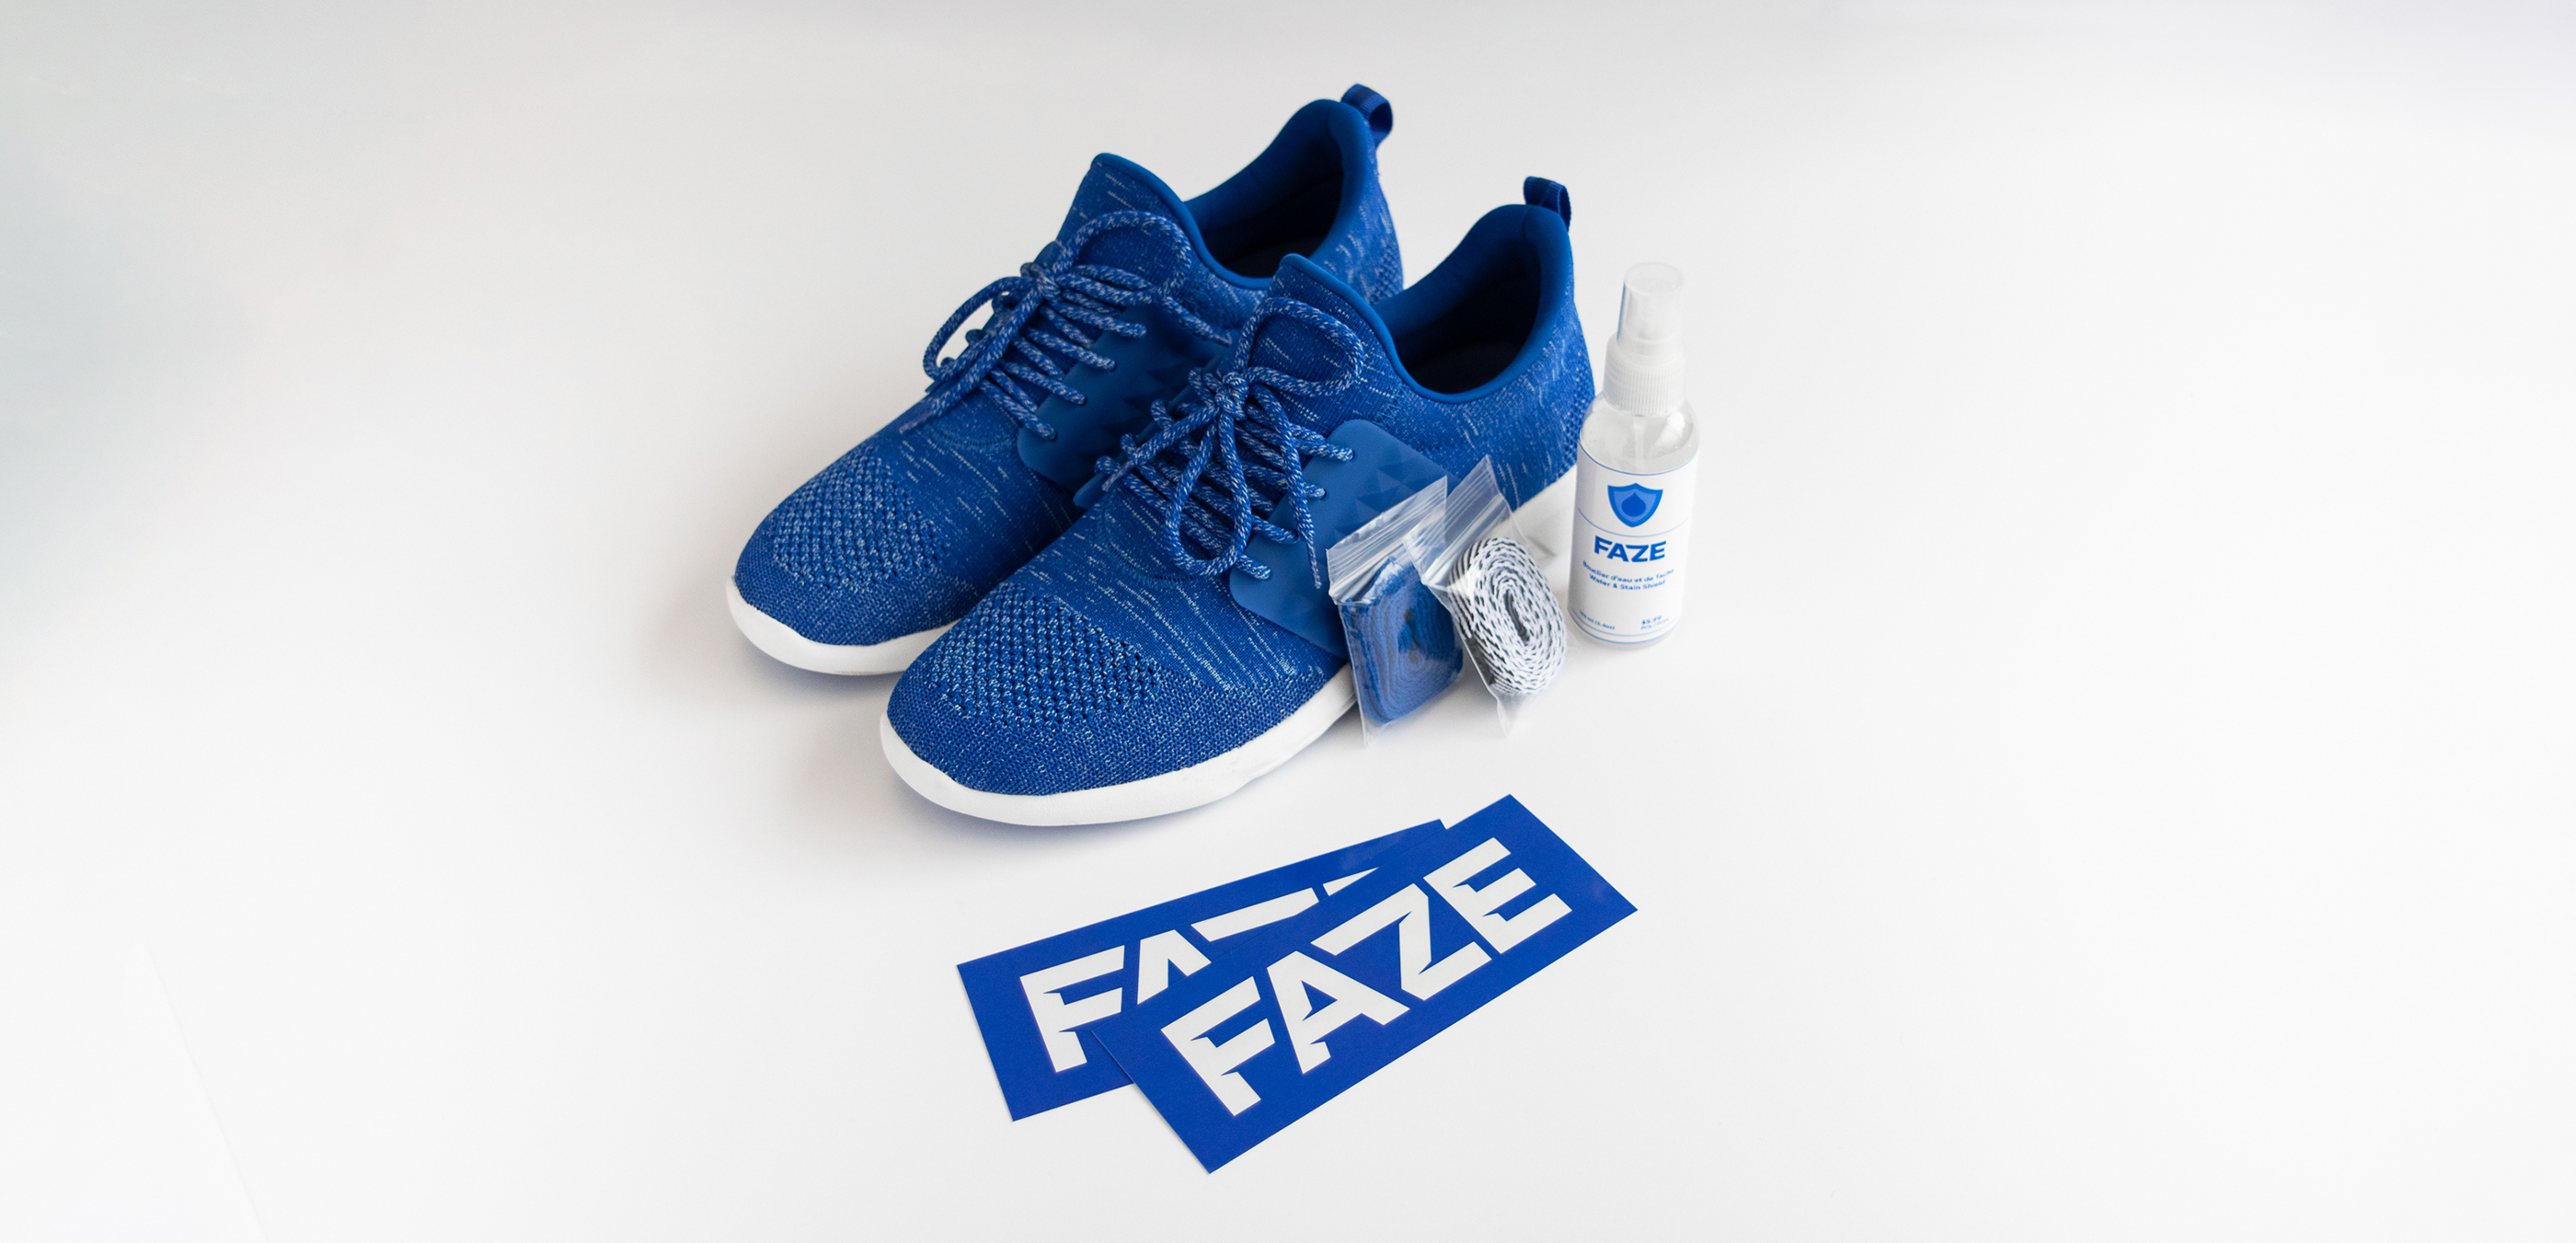 Faze Shoes and Ensemble